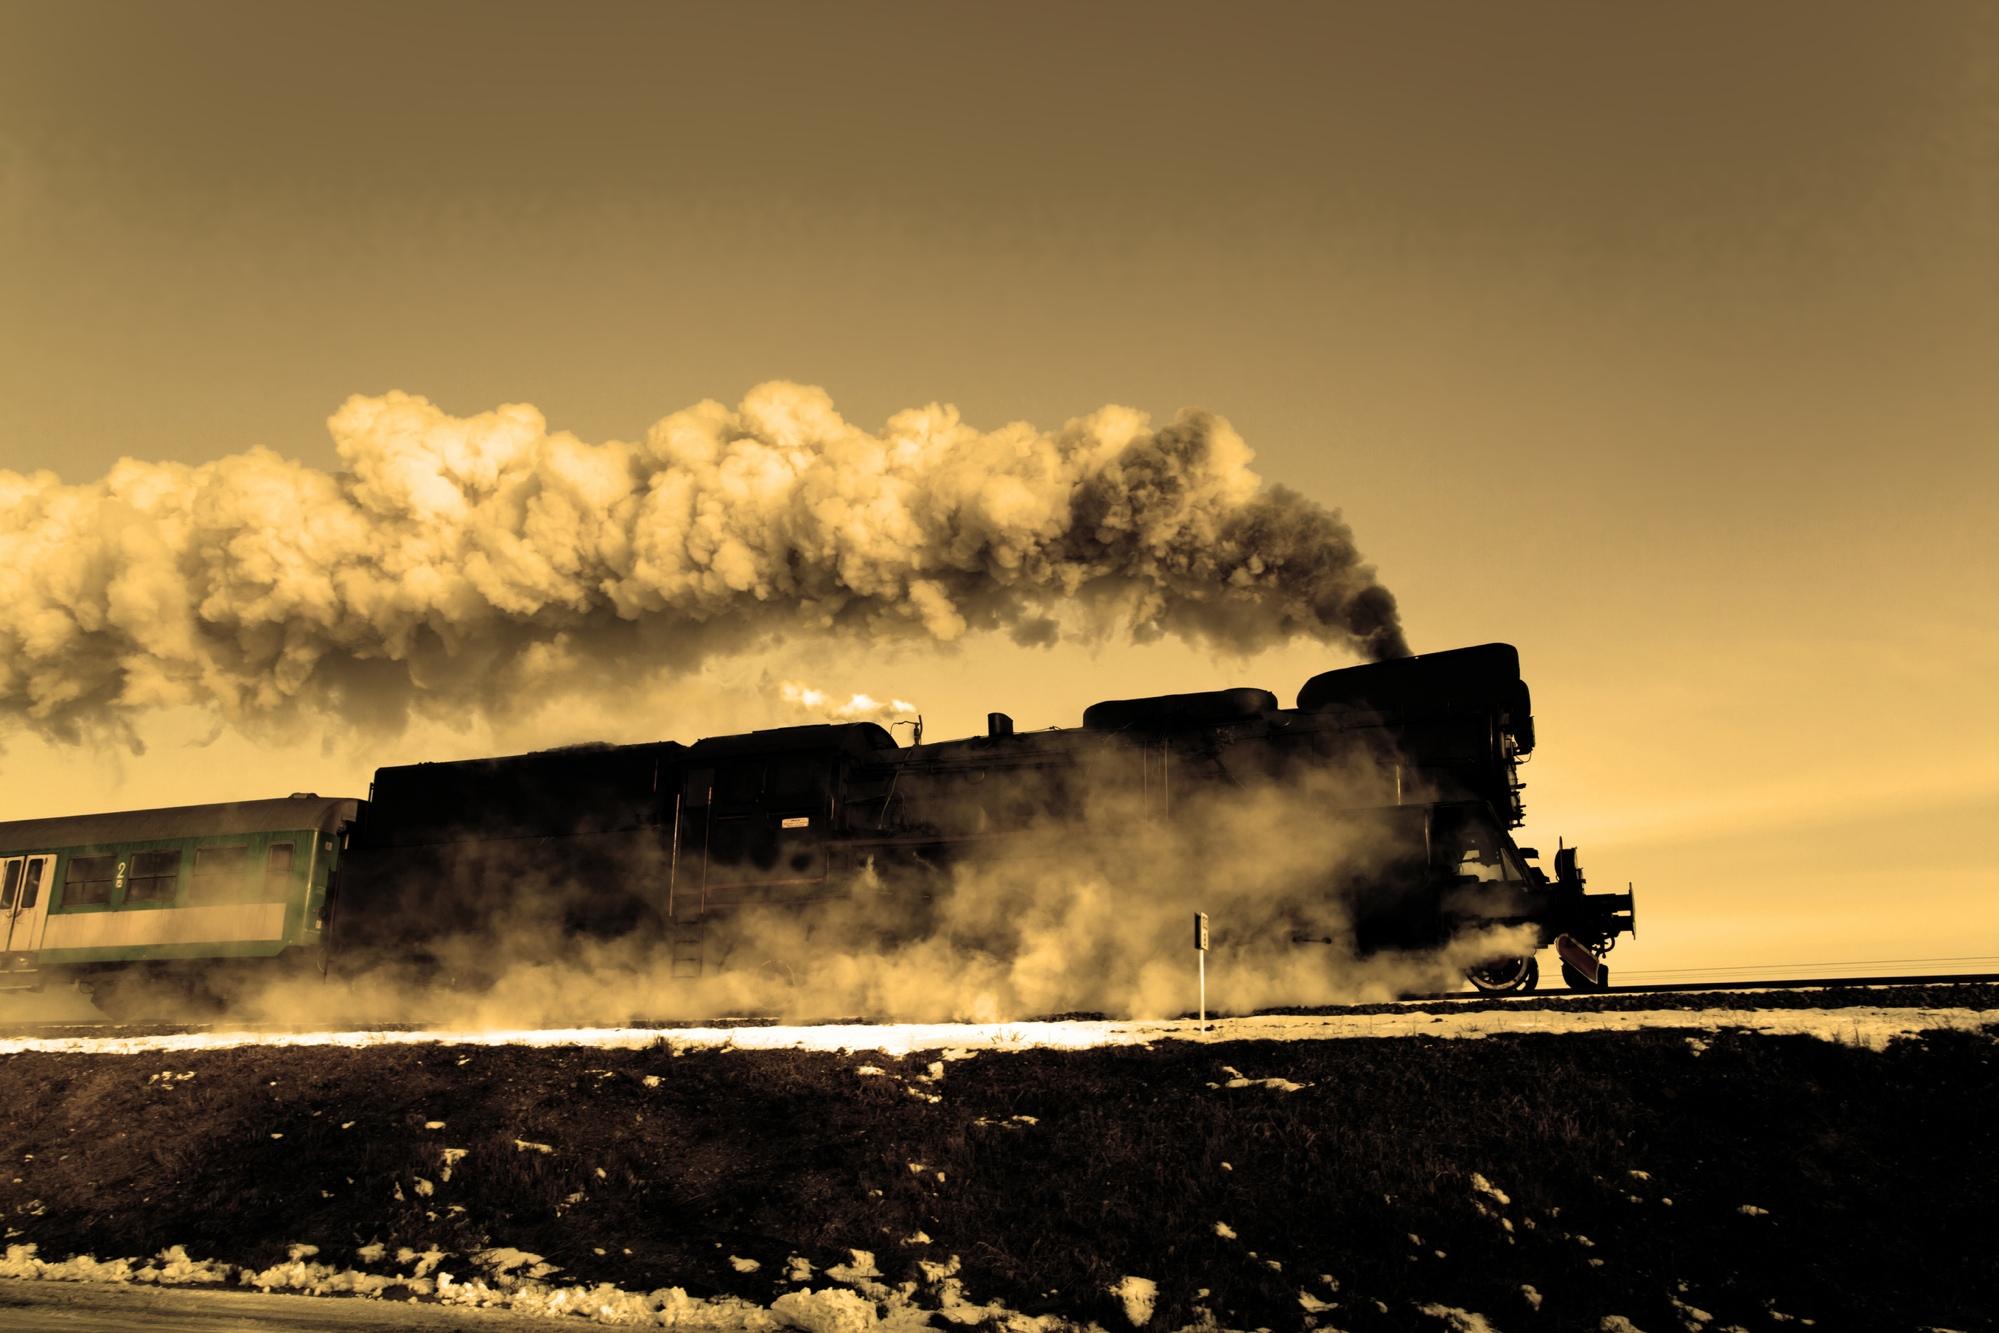 Old retro steam train   © remik44992 - Fotolia.com